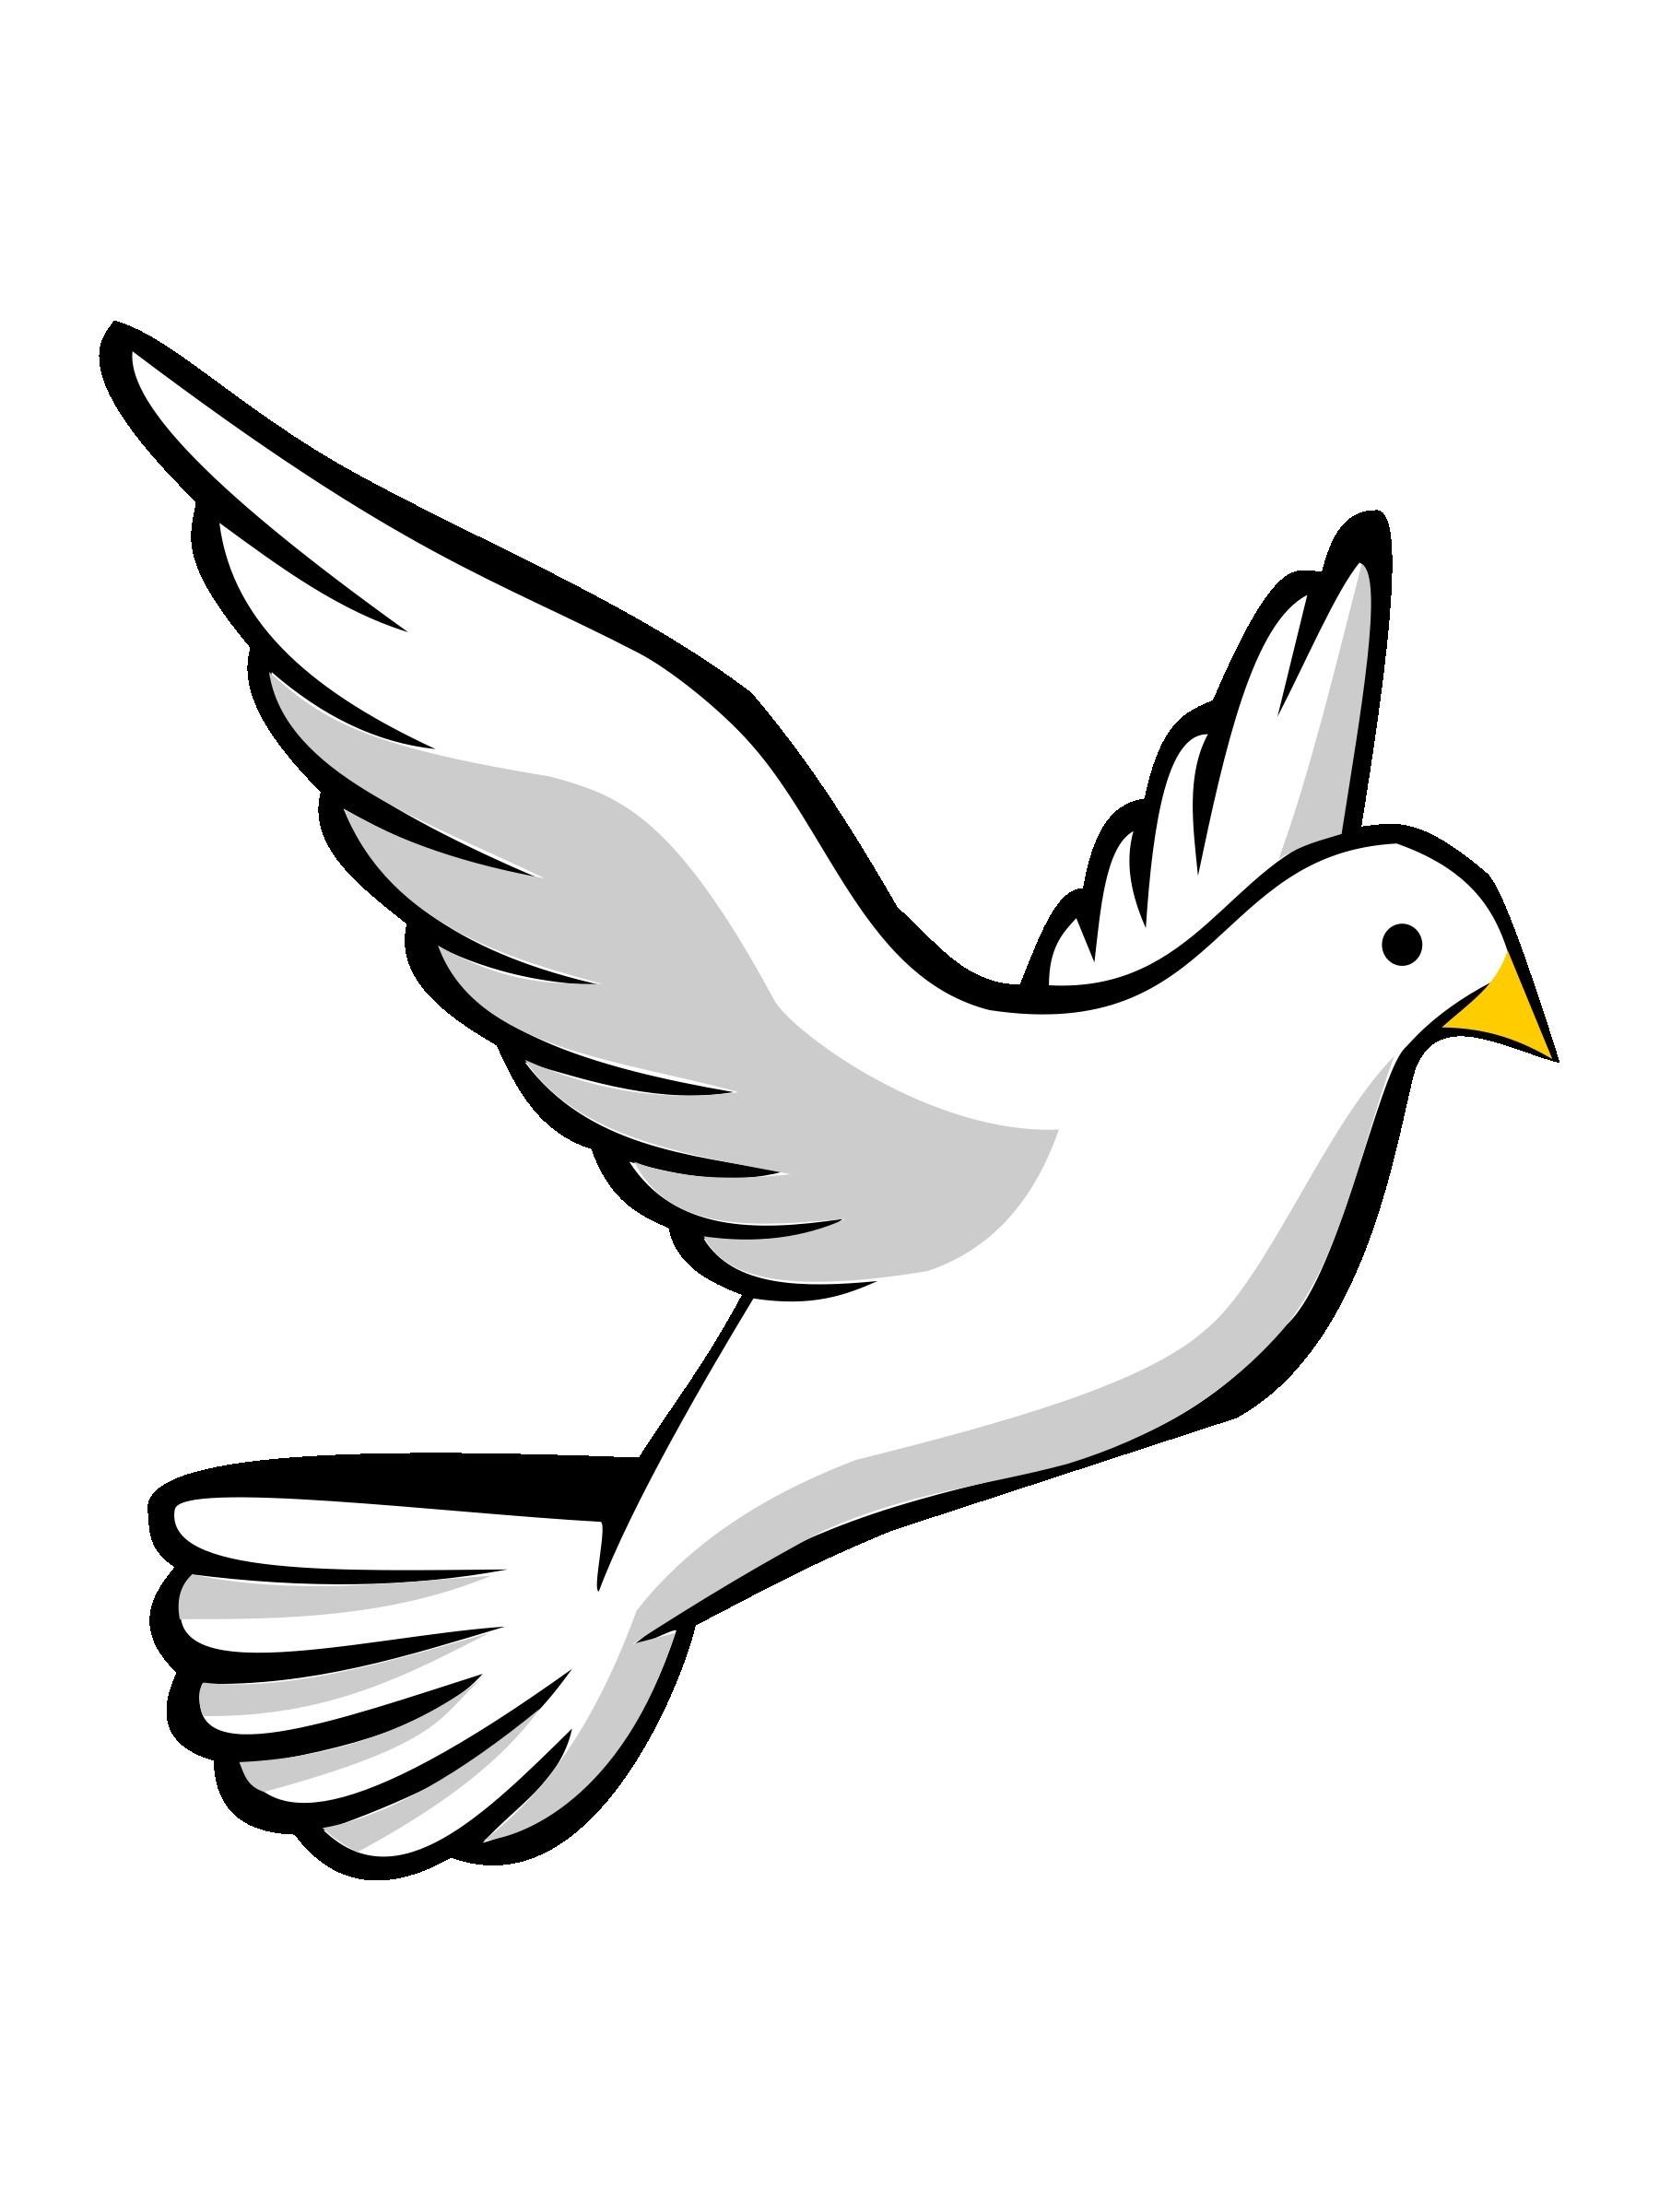 1800x2400 flying bird drawing within clip art bird easy clip art bird